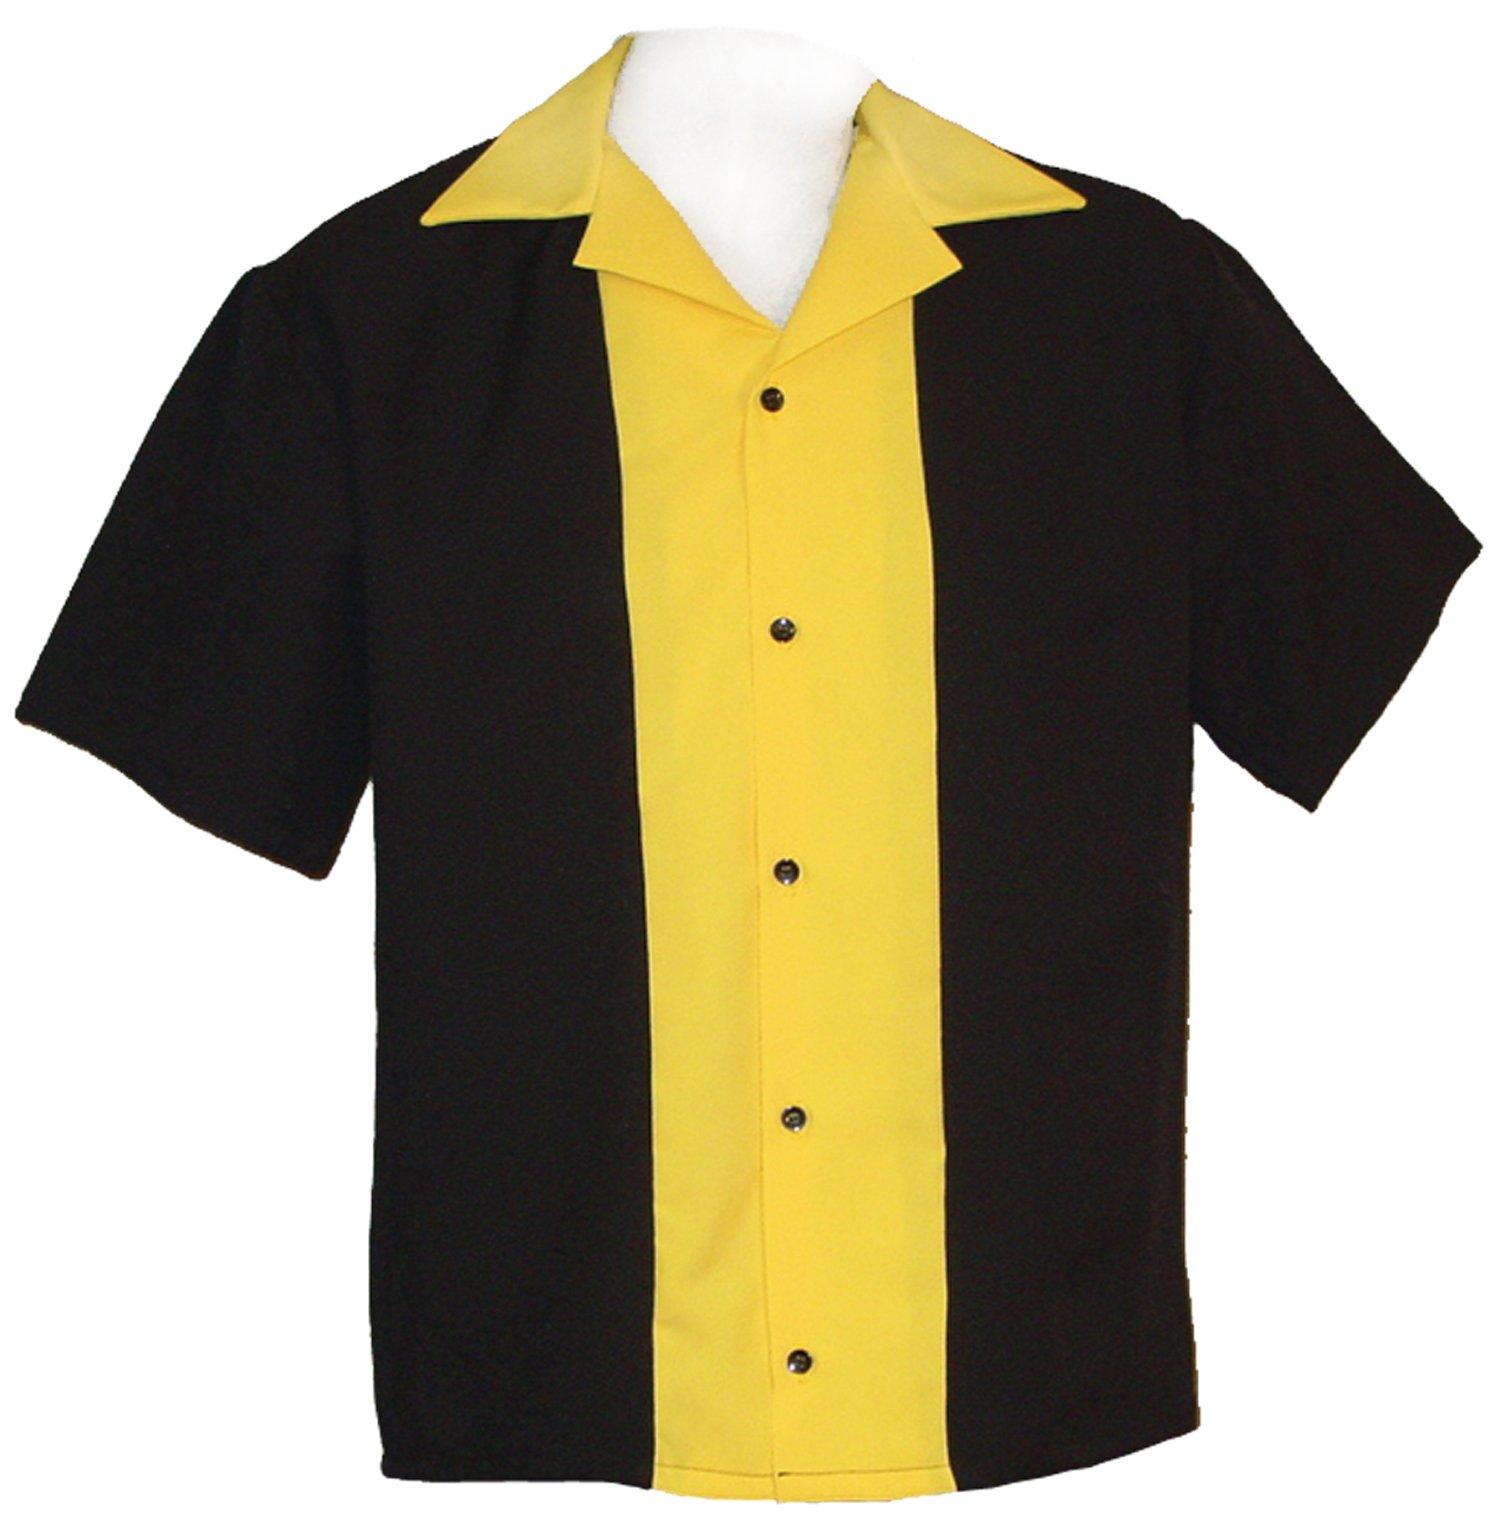 Tutti Boys Bowling Shirts Children Sizes Small 2T-3T, Medium 4-5 yrs, Large 6-7 yrs (Small 2T-3T yrs)